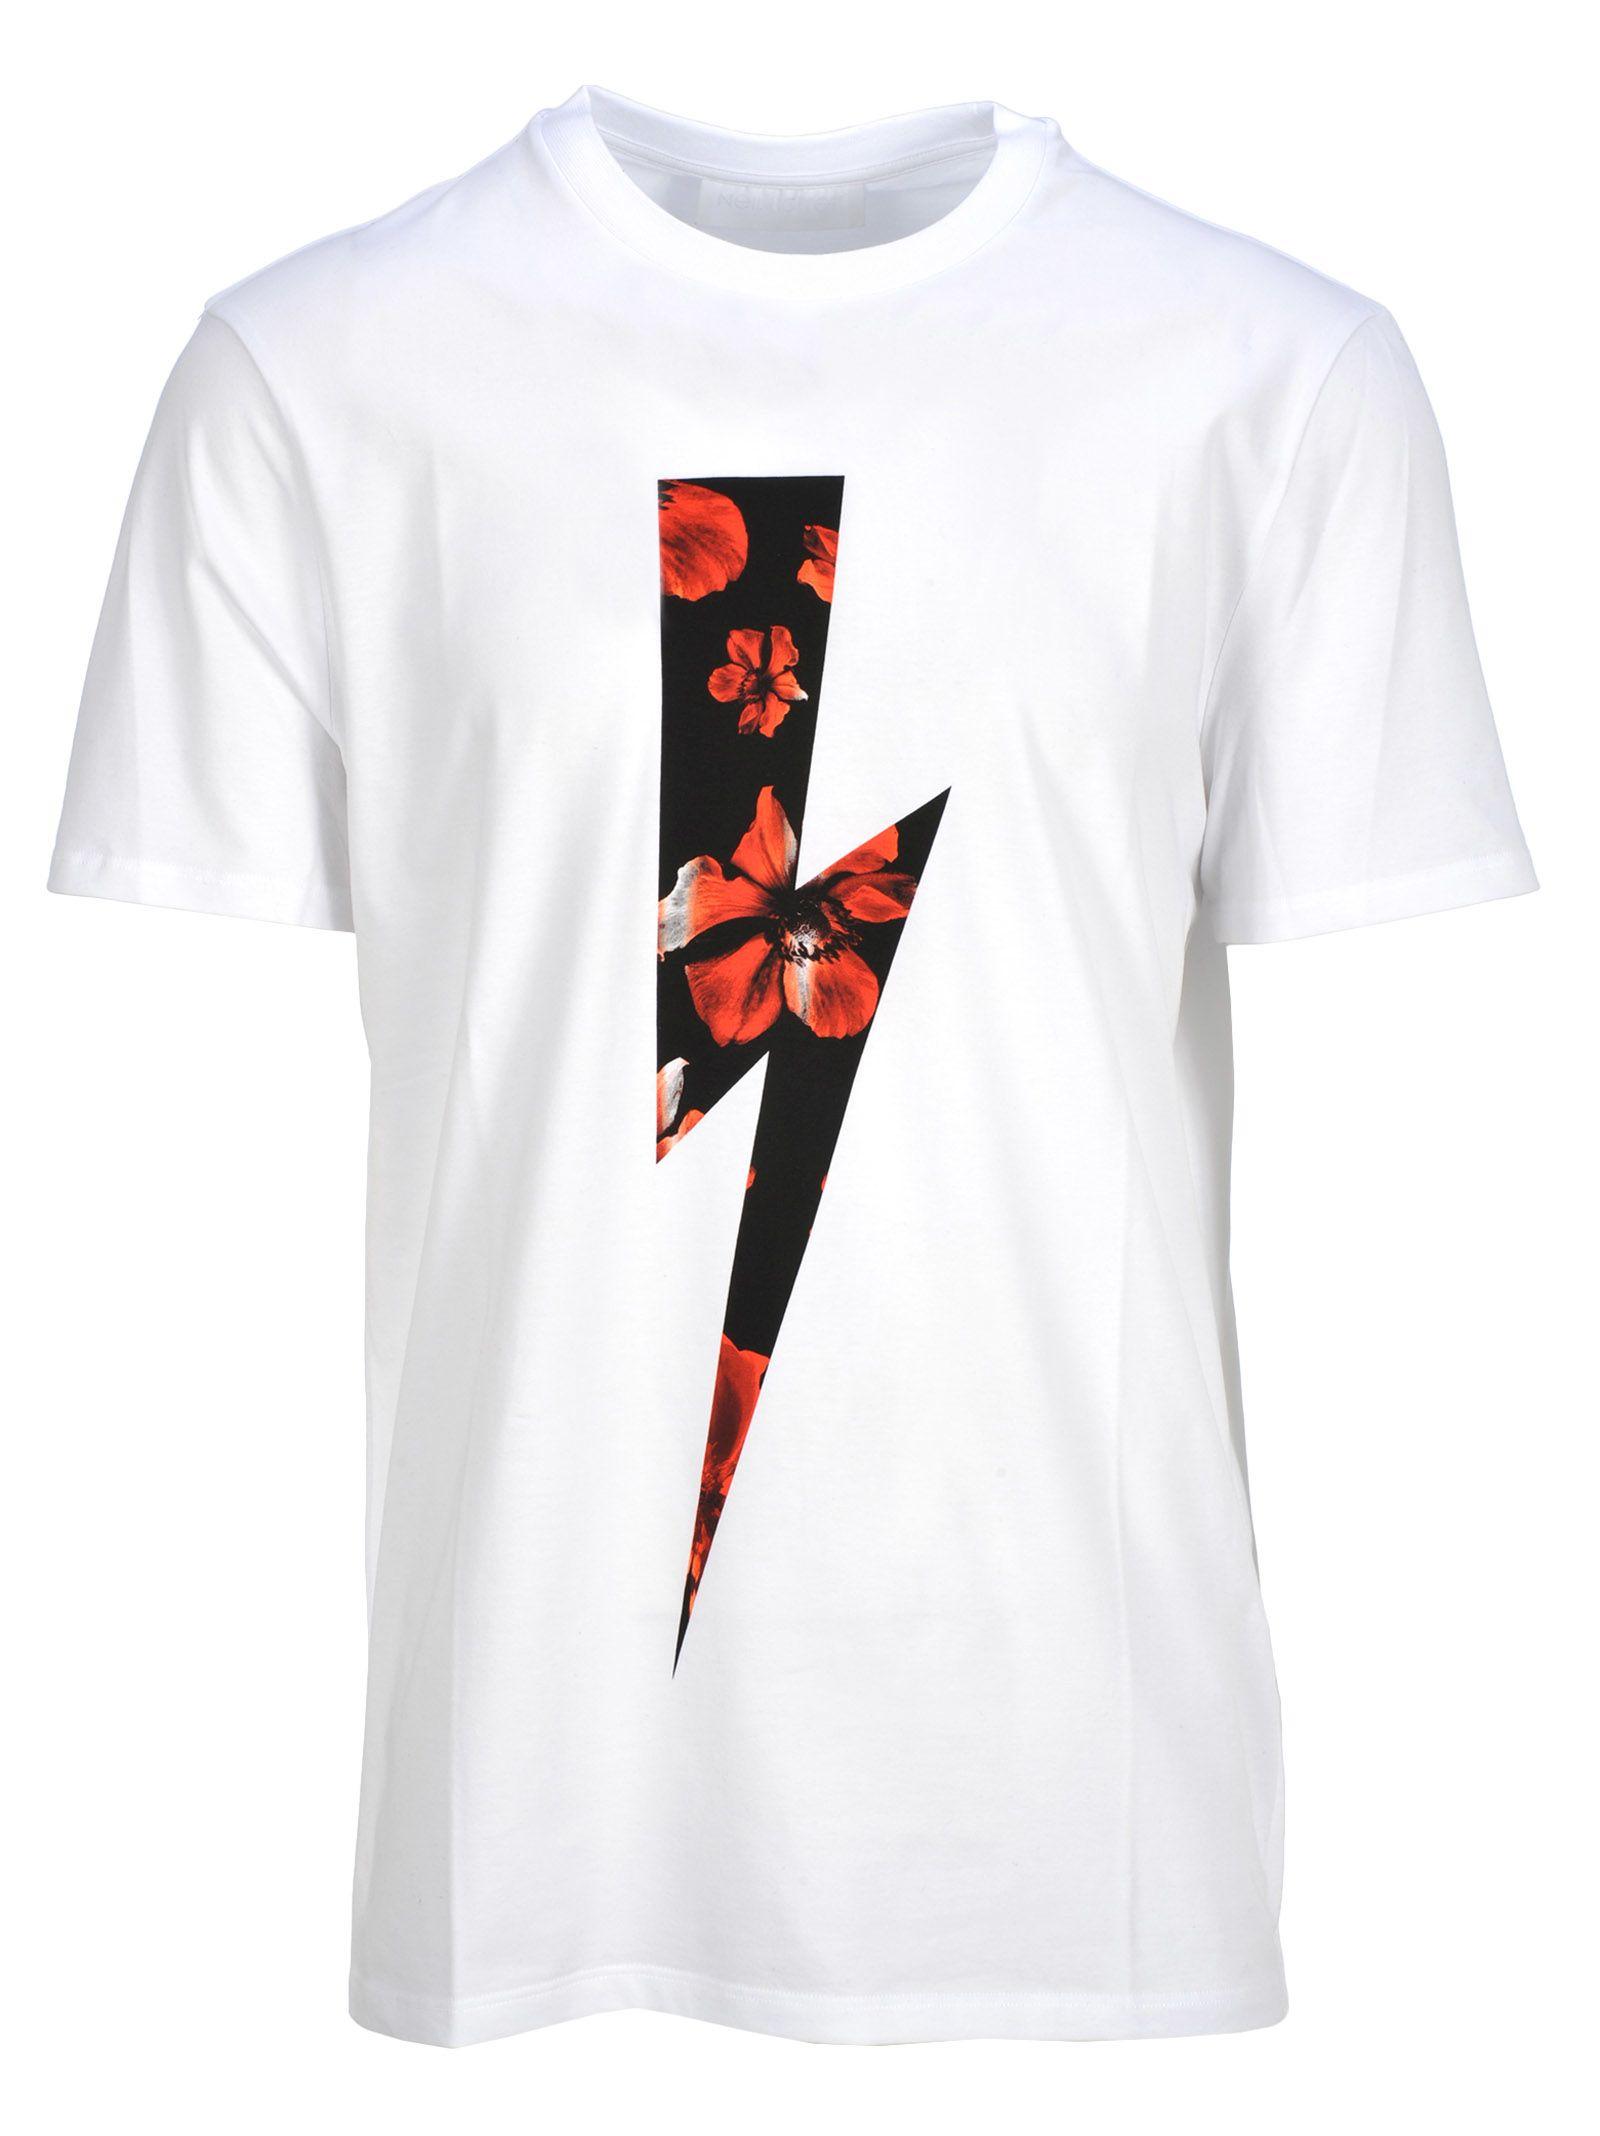 0ad87d50 Neil Barrett Neil Barrett Neil Barrett Floral Lightning Bolt T-shirt ...